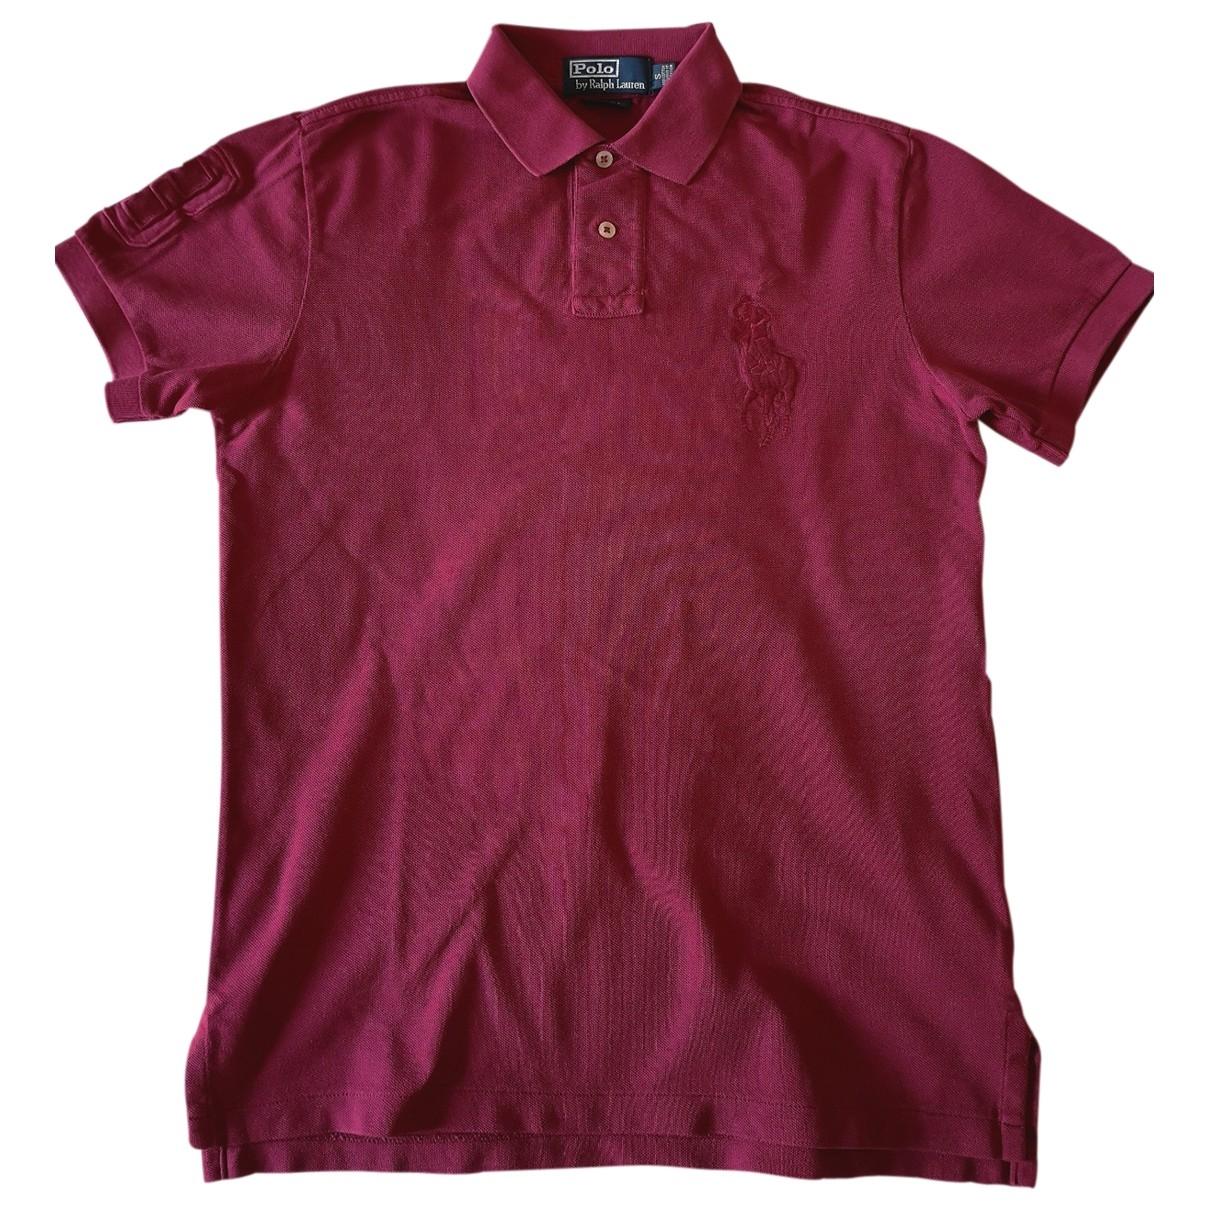 Polo Ralph Lauren - Polos Polo ajuste manches courtes pour homme en coton - rose